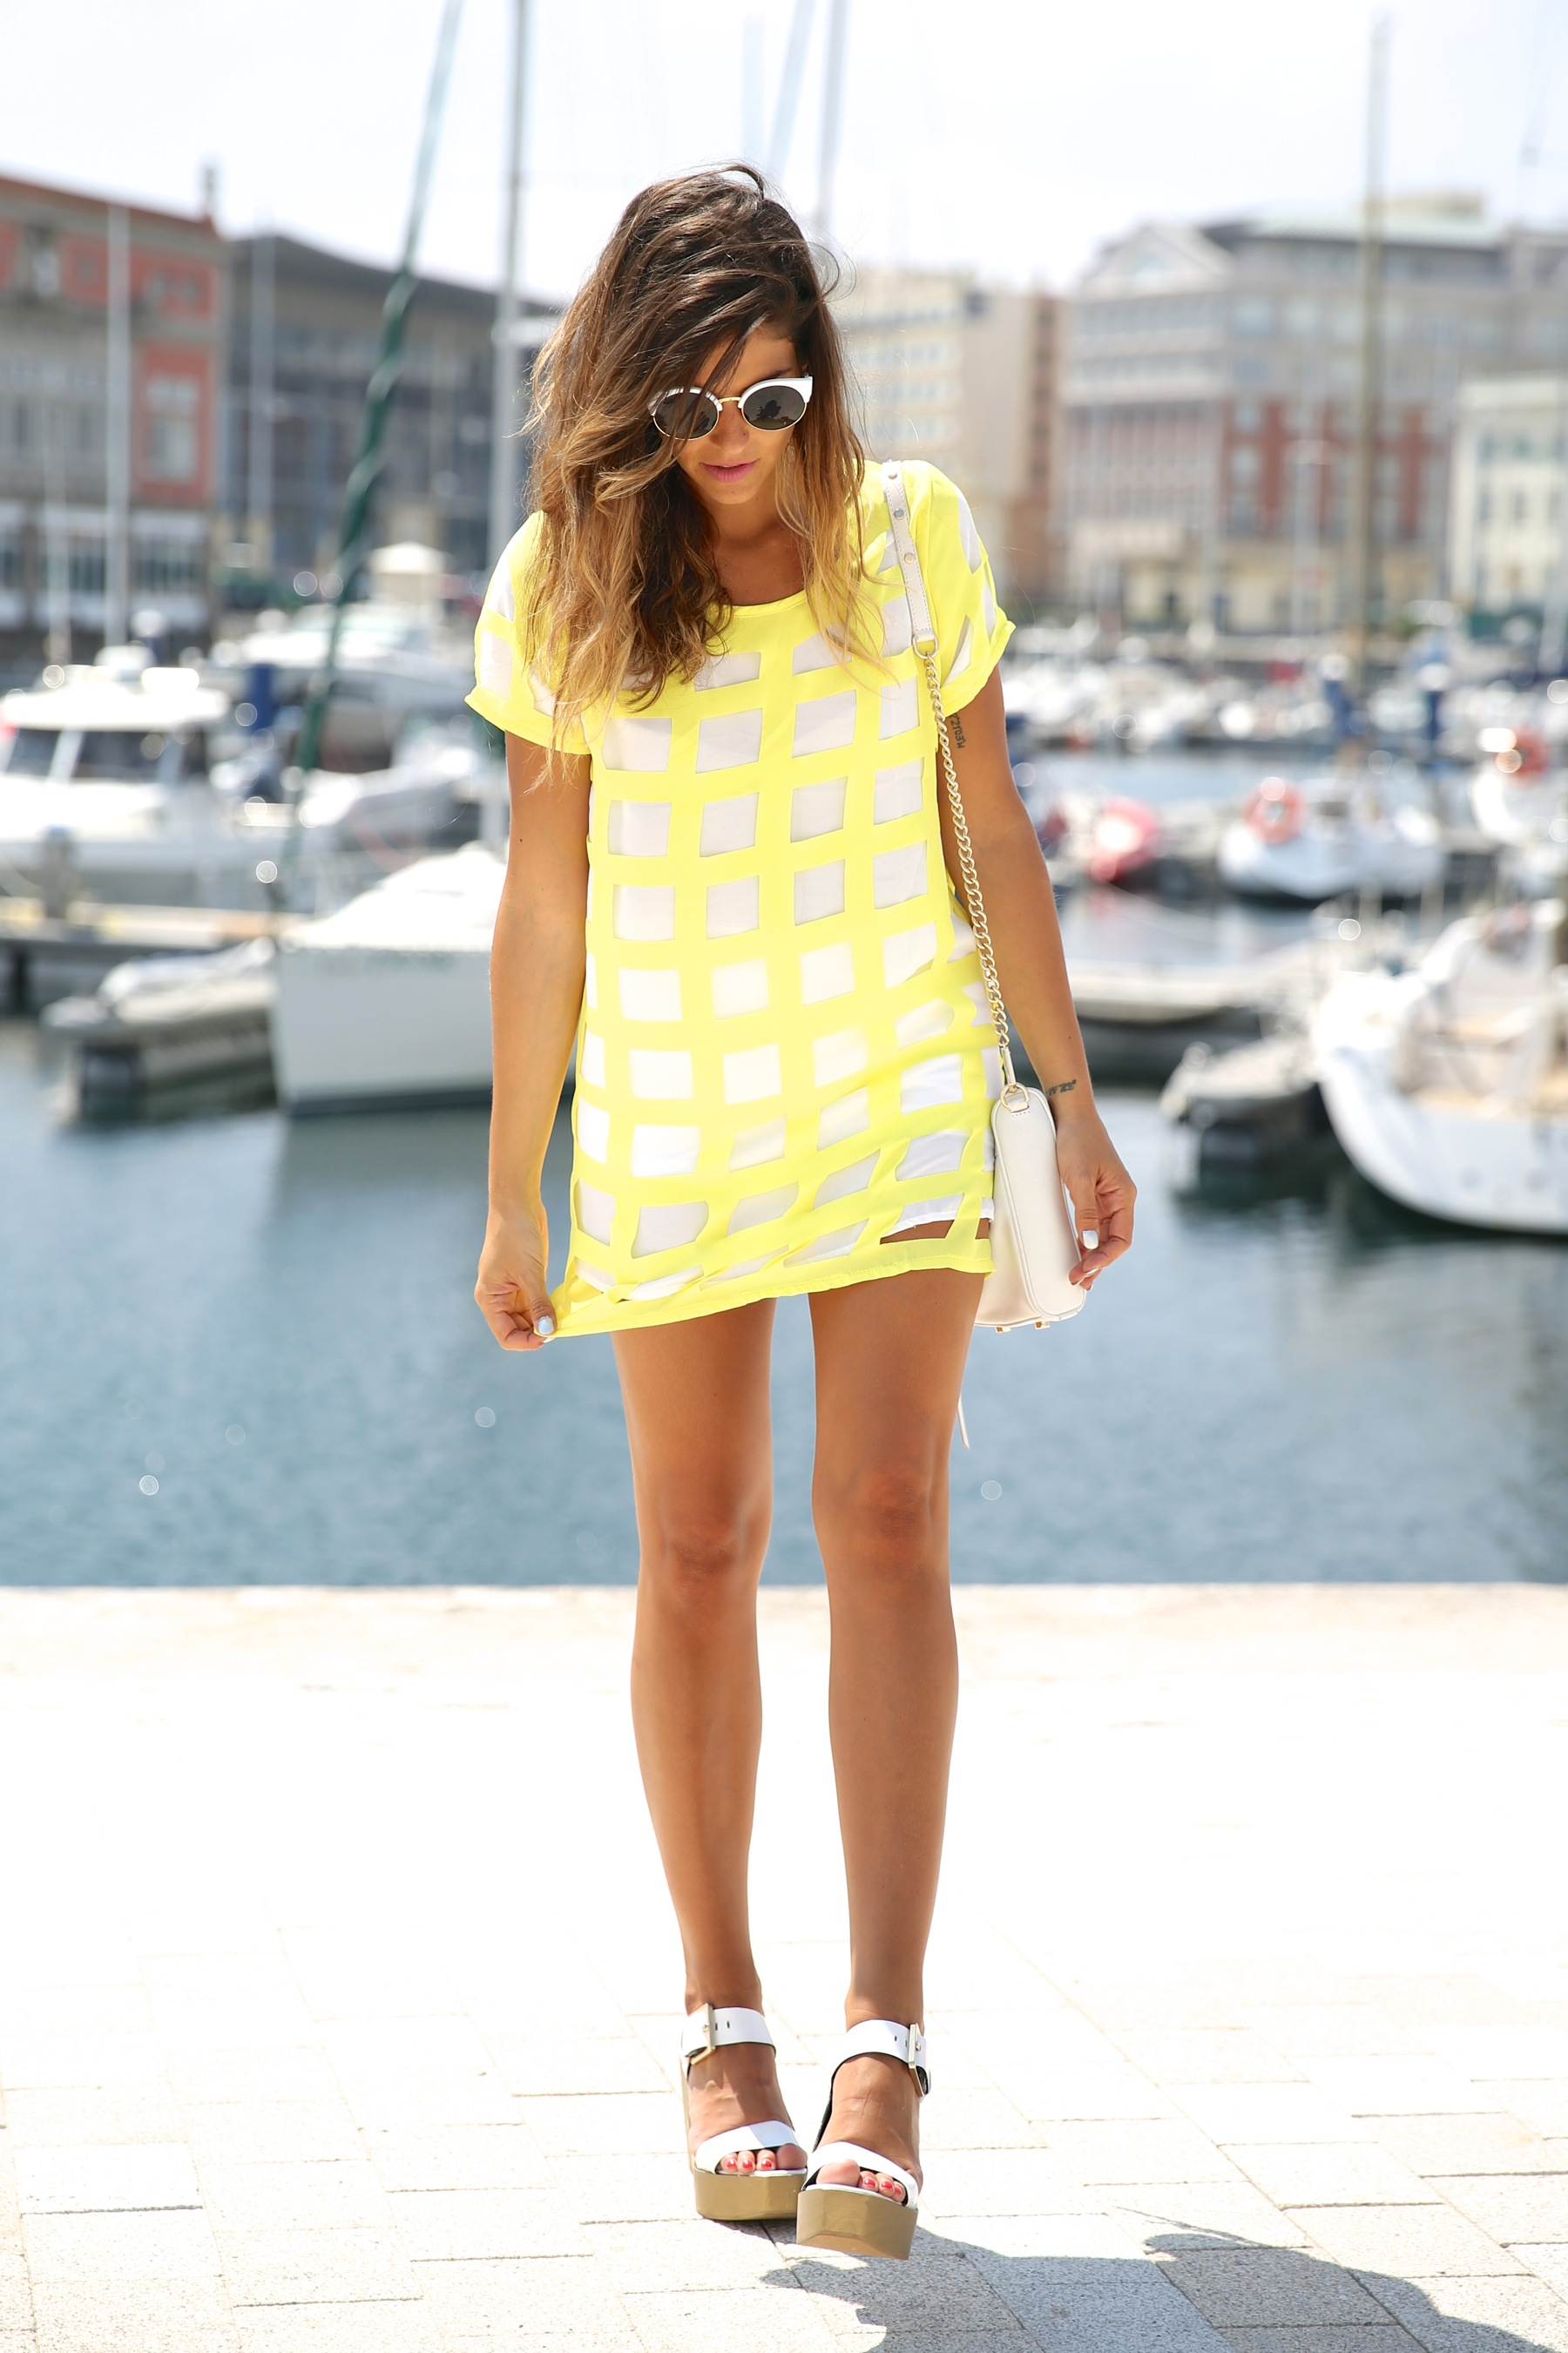 trendy_taste-look-outfit-street_style-ootd-blog-blogger-moda_españa-fashion_spain-coruña-galicia-sandalias_plataforma-platform_sandals-rebecca_minkoff-yellow-amarillo-vestido-dress-plaid-cuadros-10